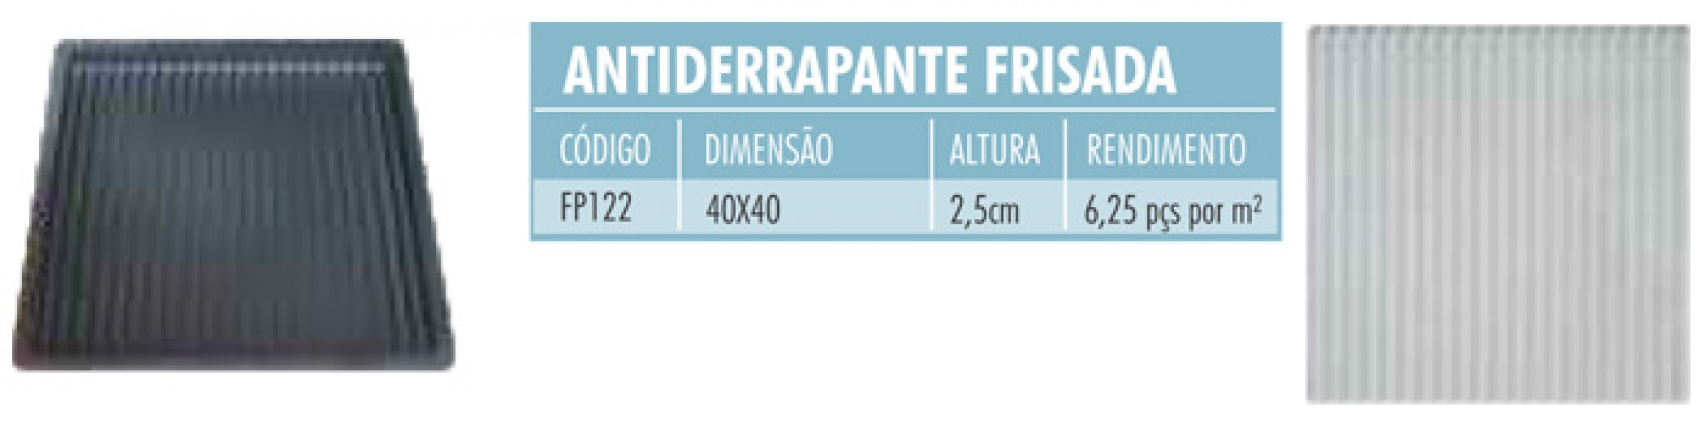 FormasPlasticas-20150313121317.jpg